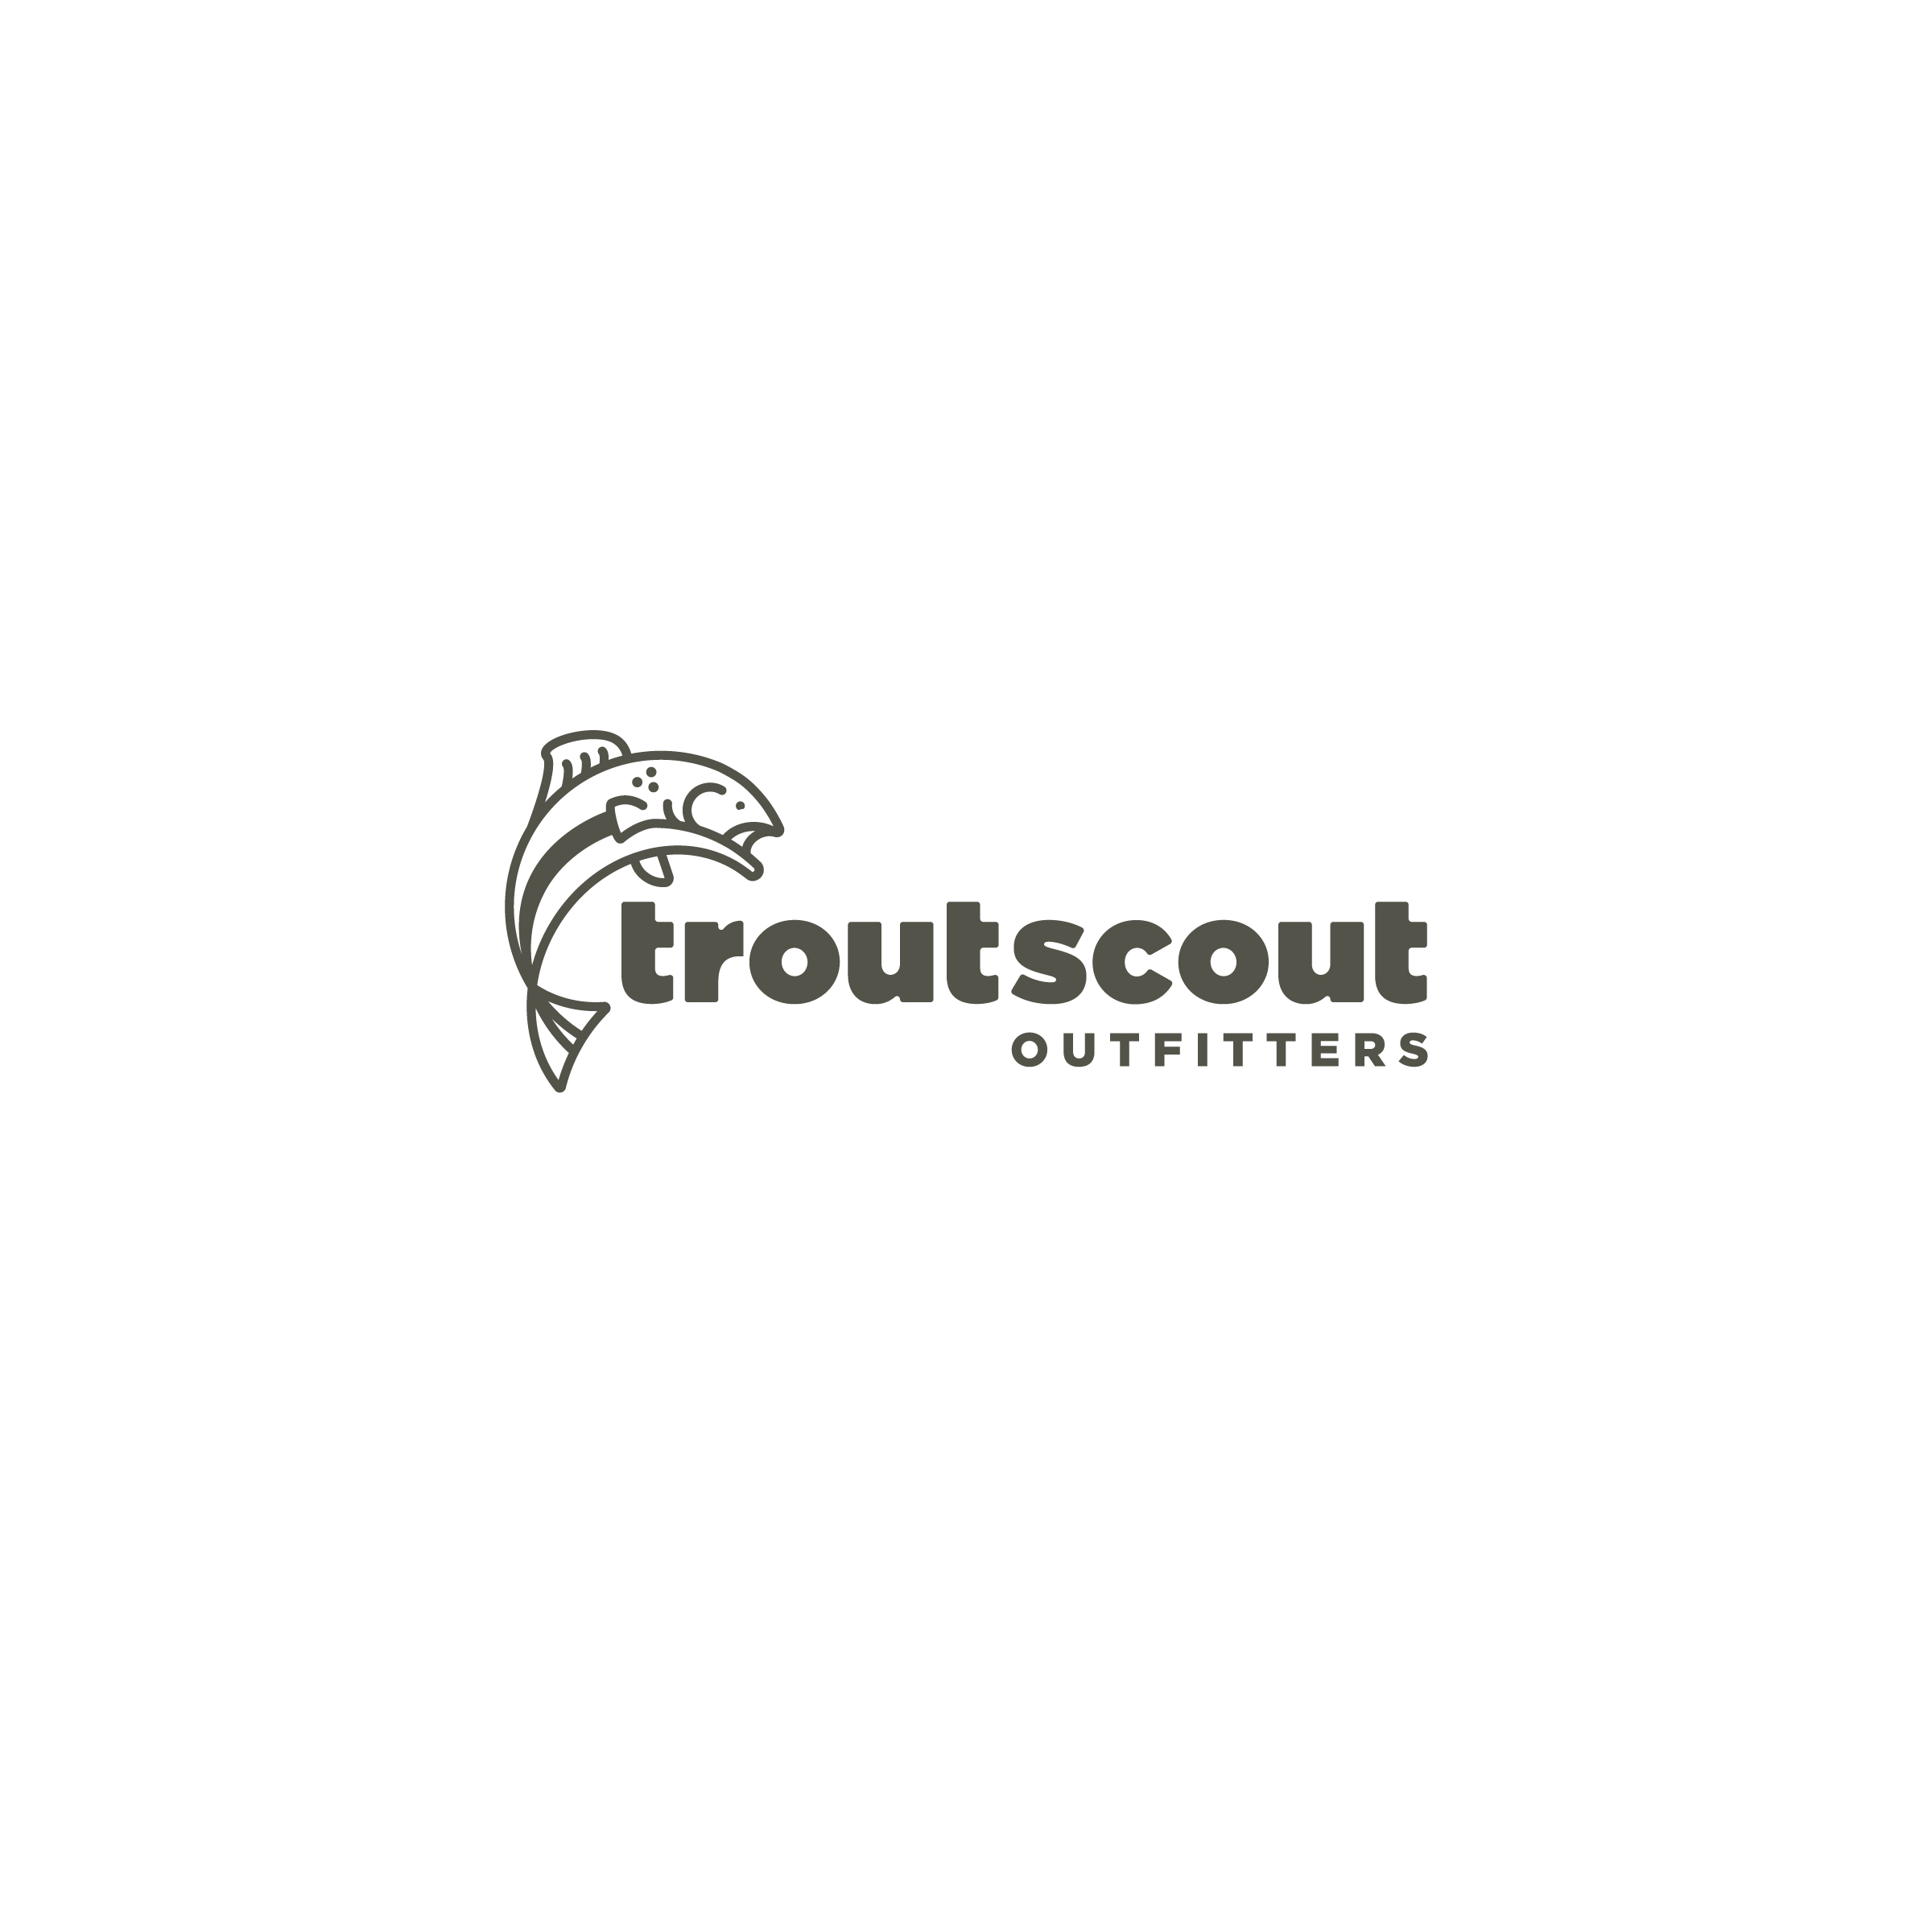 TroutScoutOutfitters_DkGrey_Hrzt.jpg